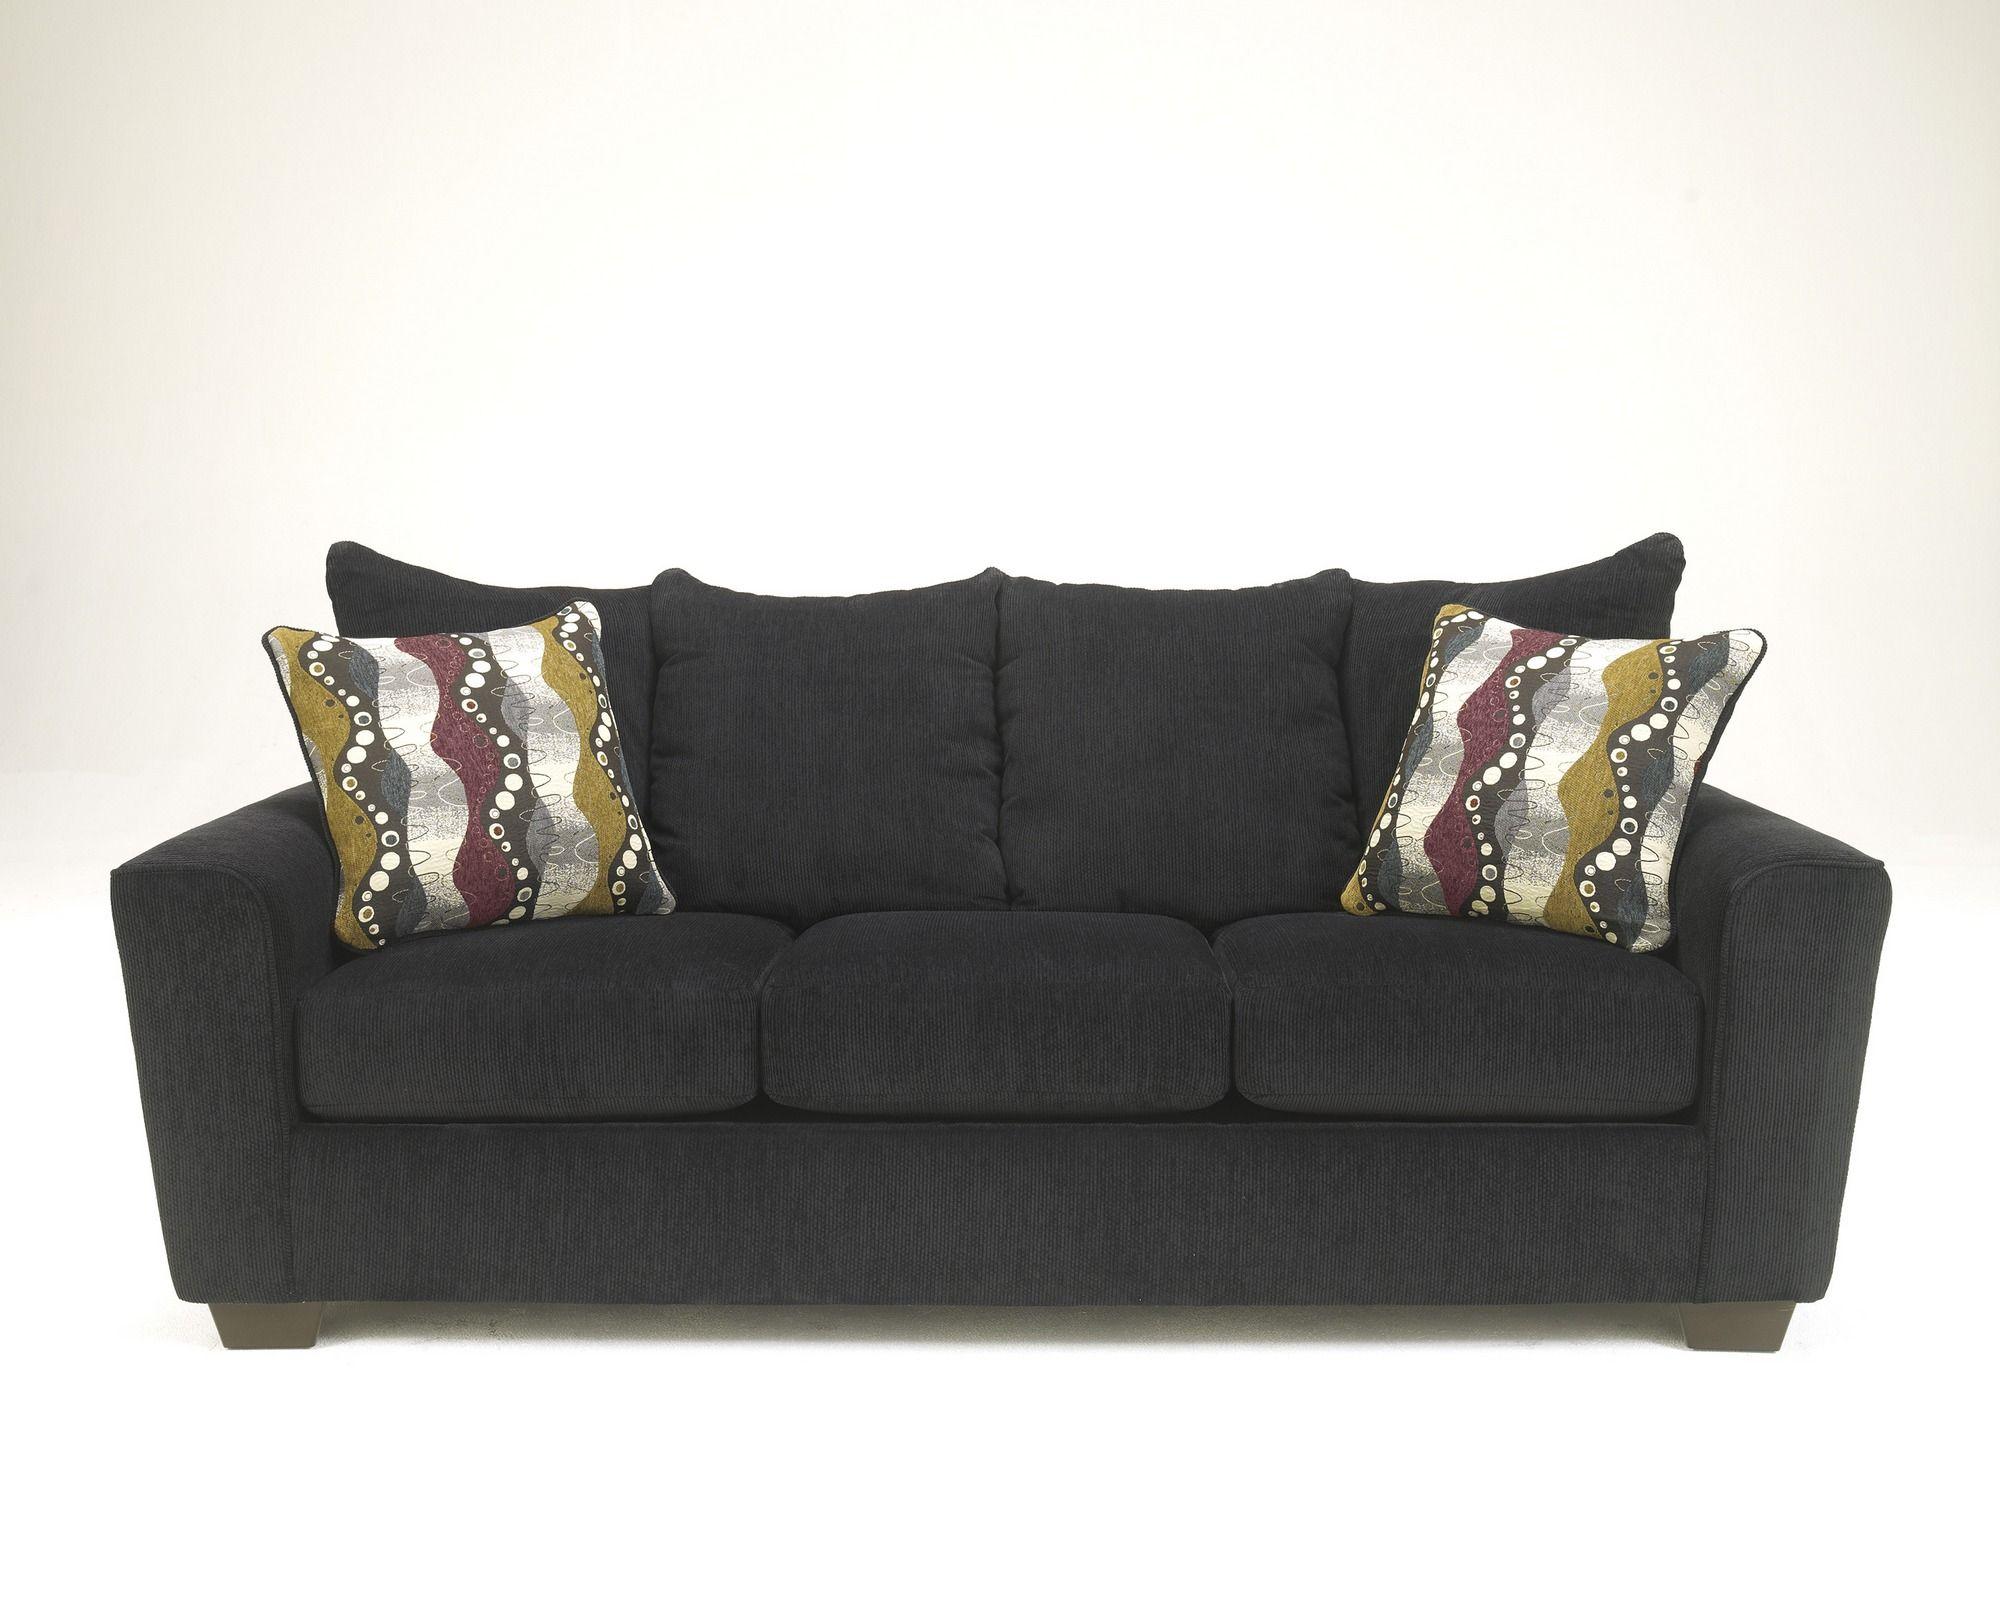 Awesome 2690038 Benchcraft By Ashley Brogain Ebony Sofa Ebony Pdpeps Interior Chair Design Pdpepsorg